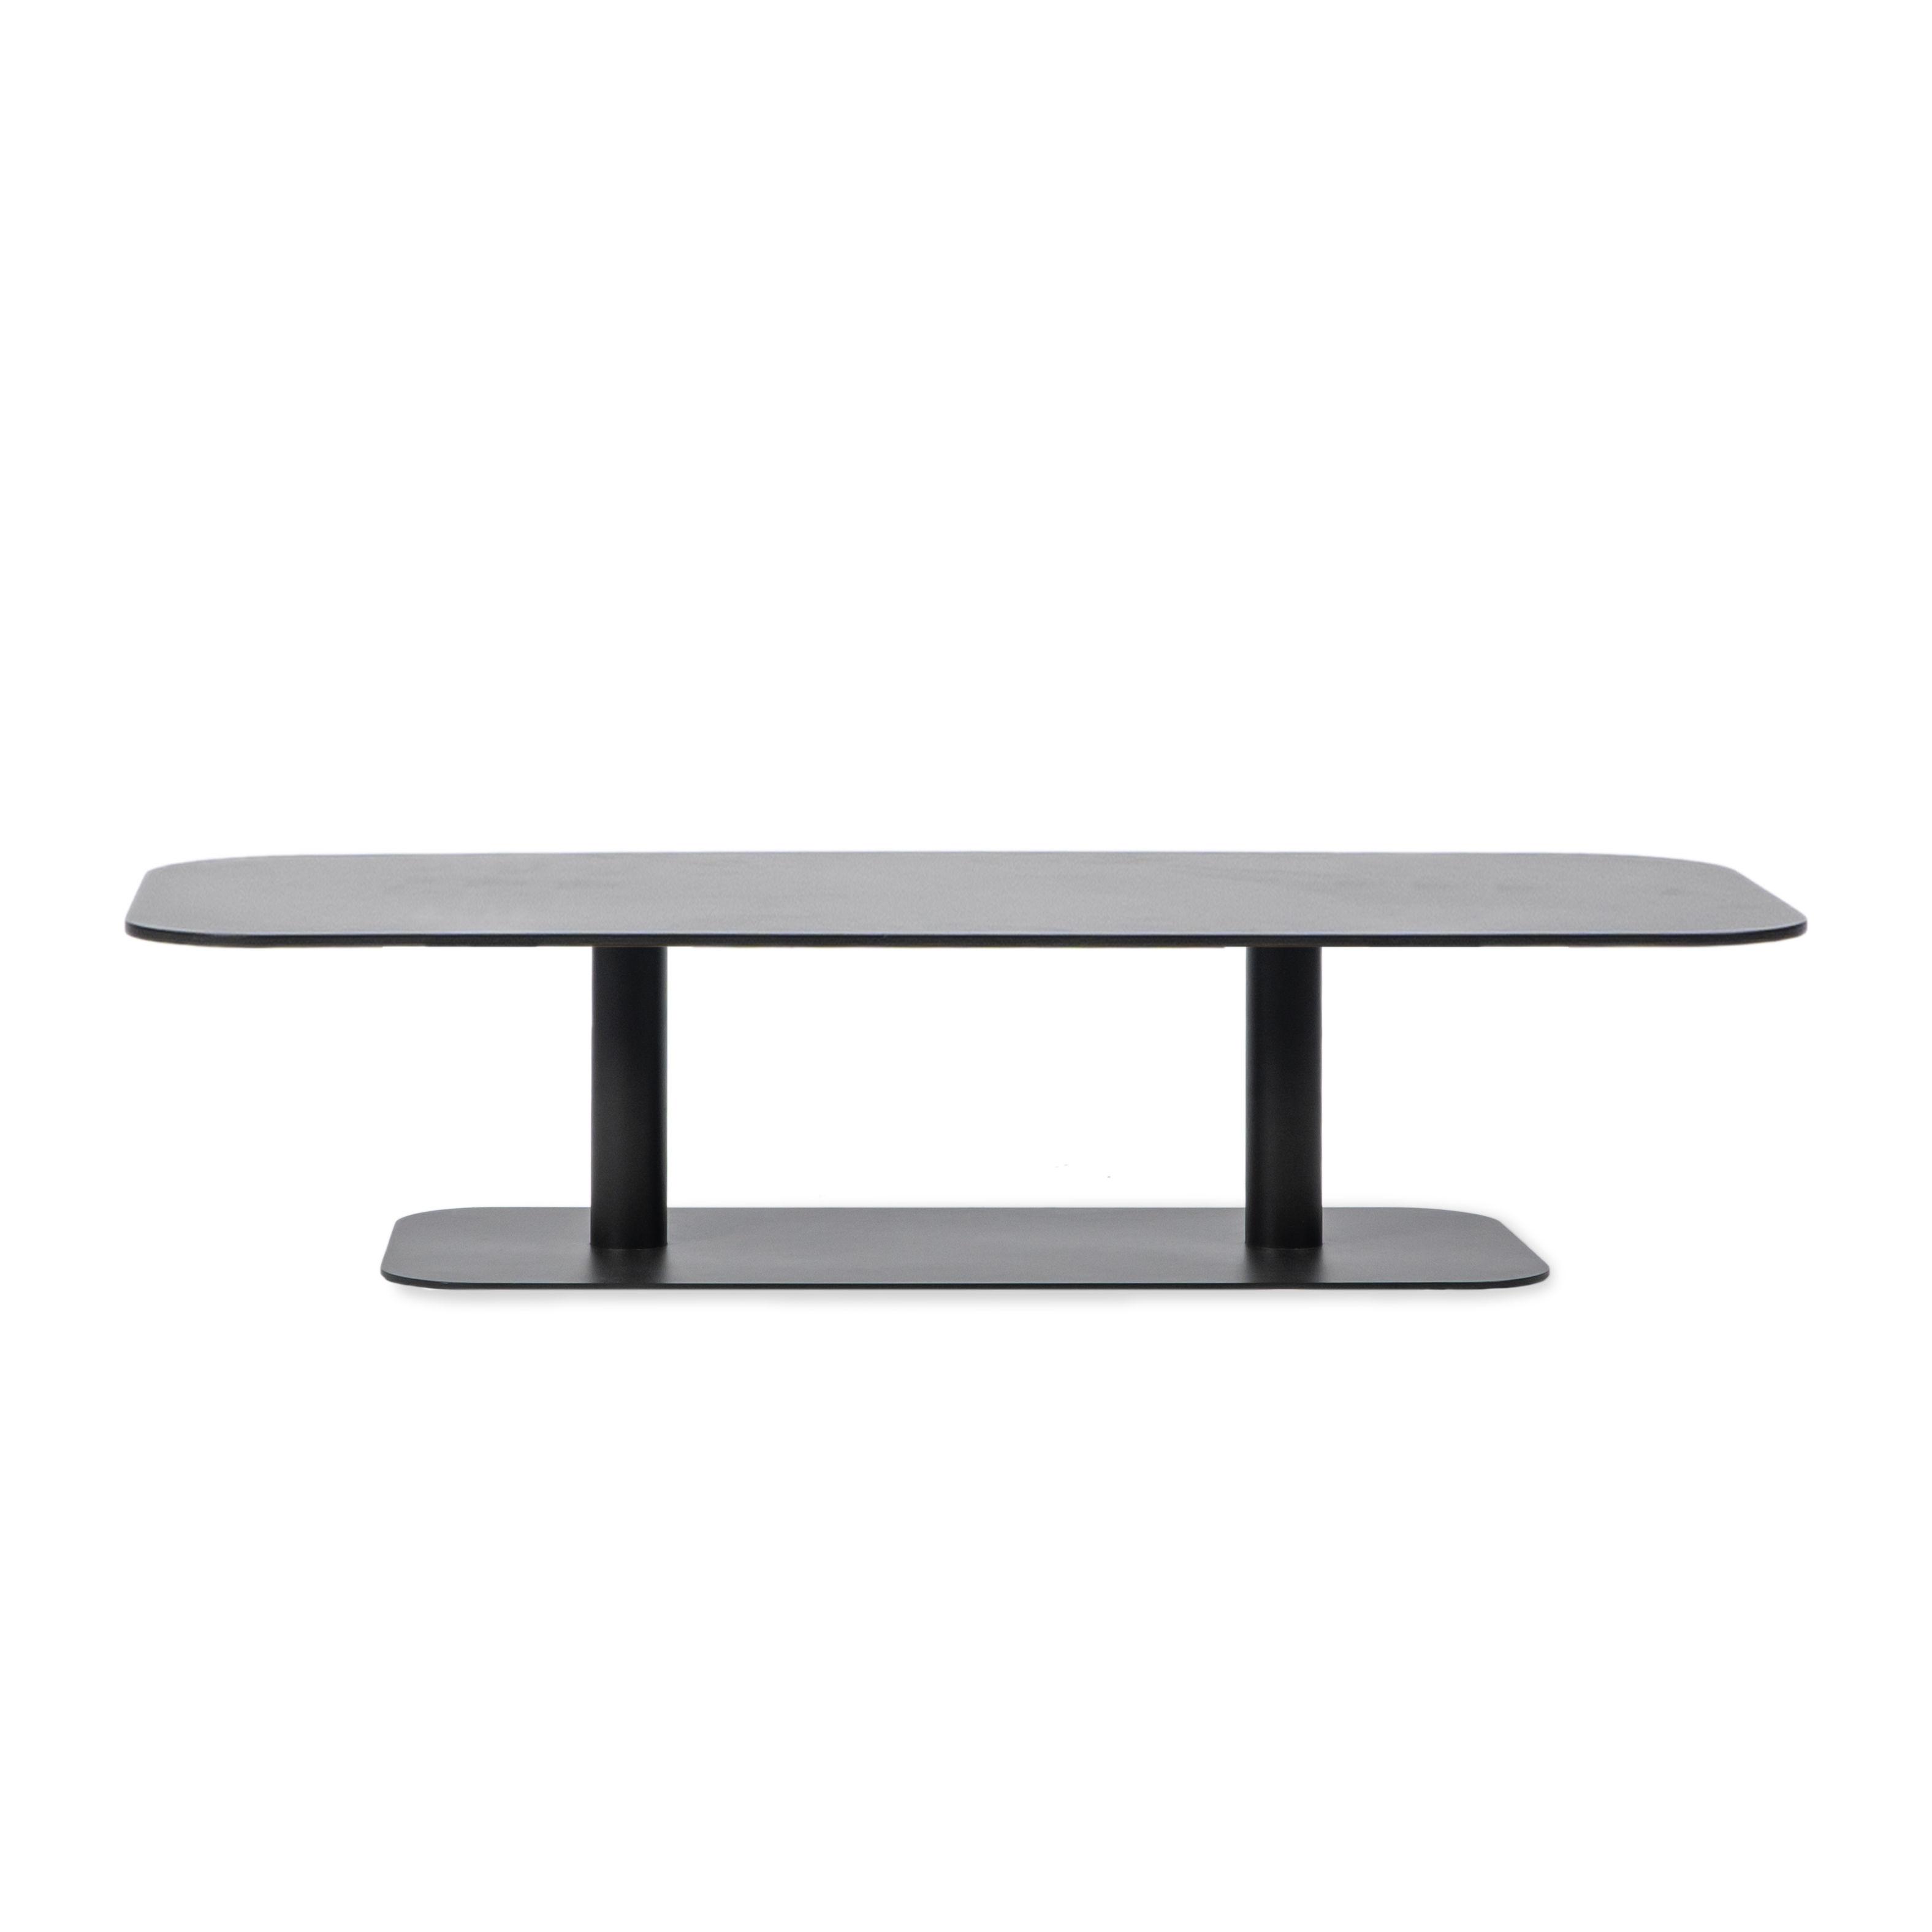 Möbel - Couchtische - Kodo Couchtisch / 129 x 45 cm - Aluminium - Vincent Sheppard - Fossilgrau - Aluminium thermolaqué